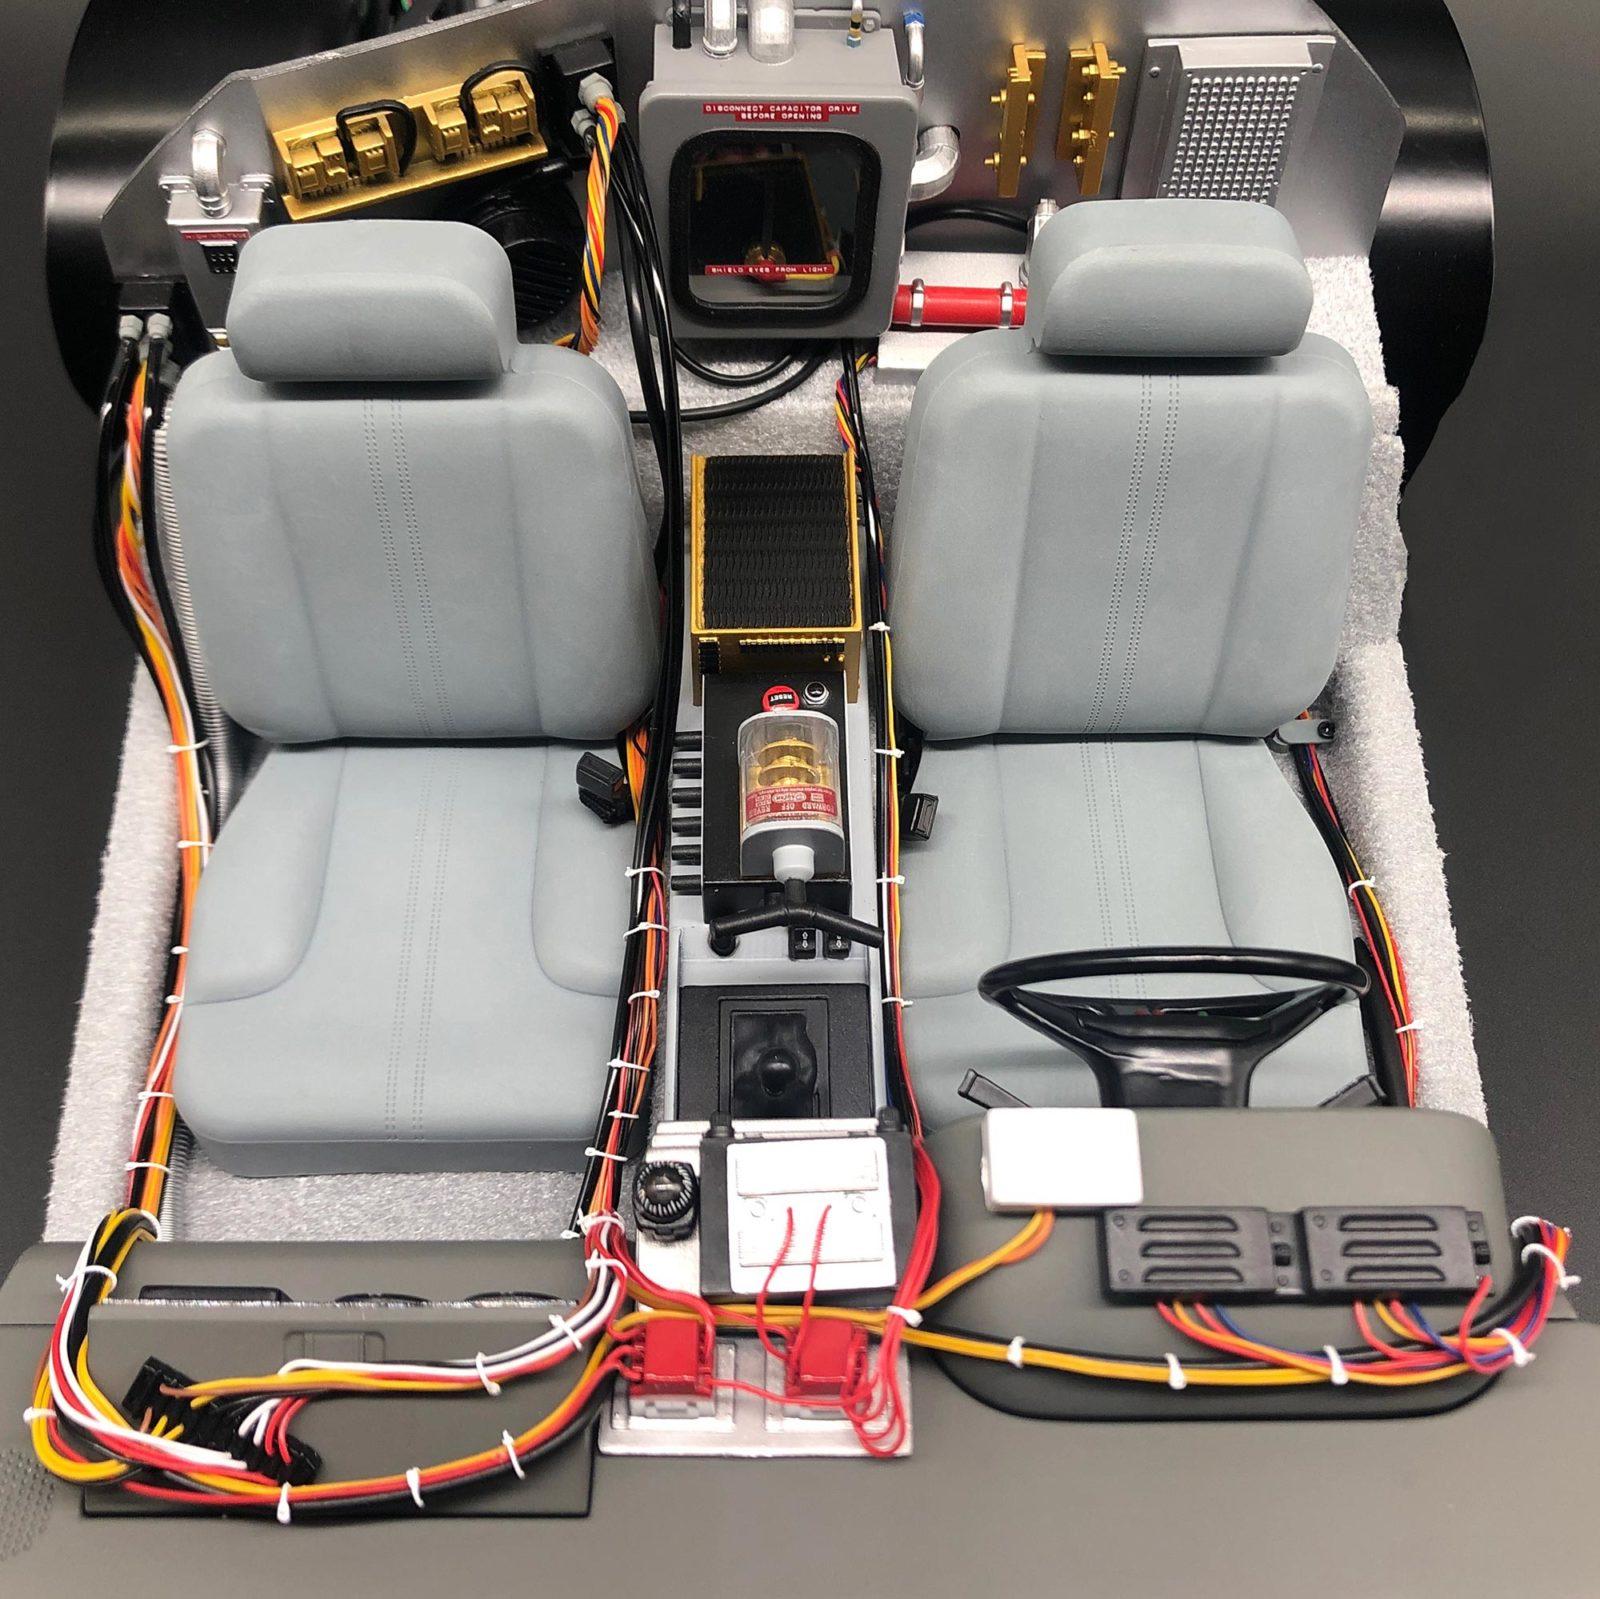 Above view of Mini Cable Ties mod in DeLorean model